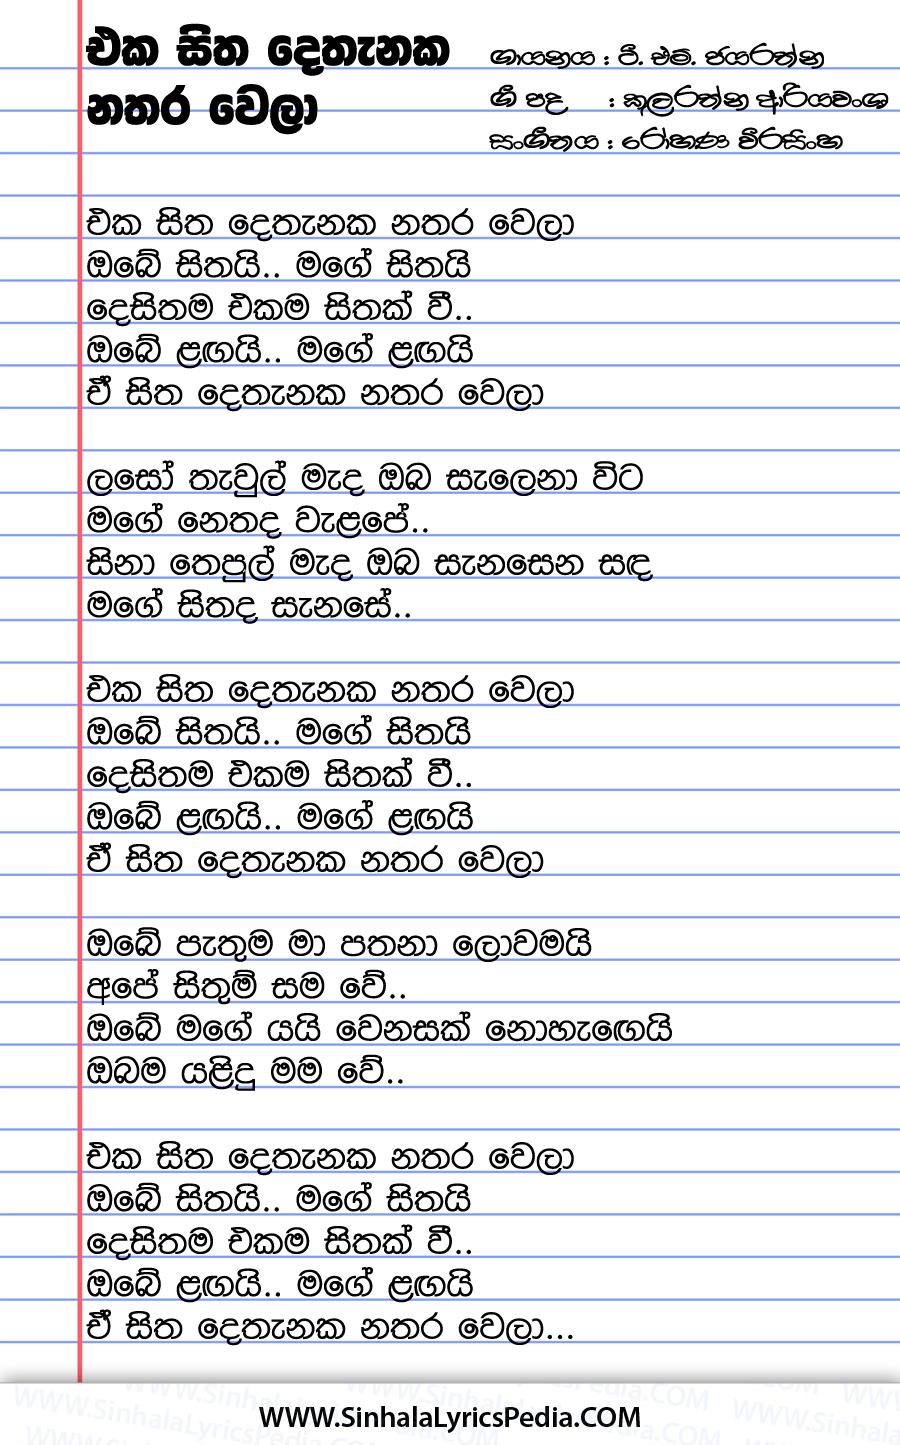 Eka Sitha Dethanaka Nathara Wela Song Lyrics